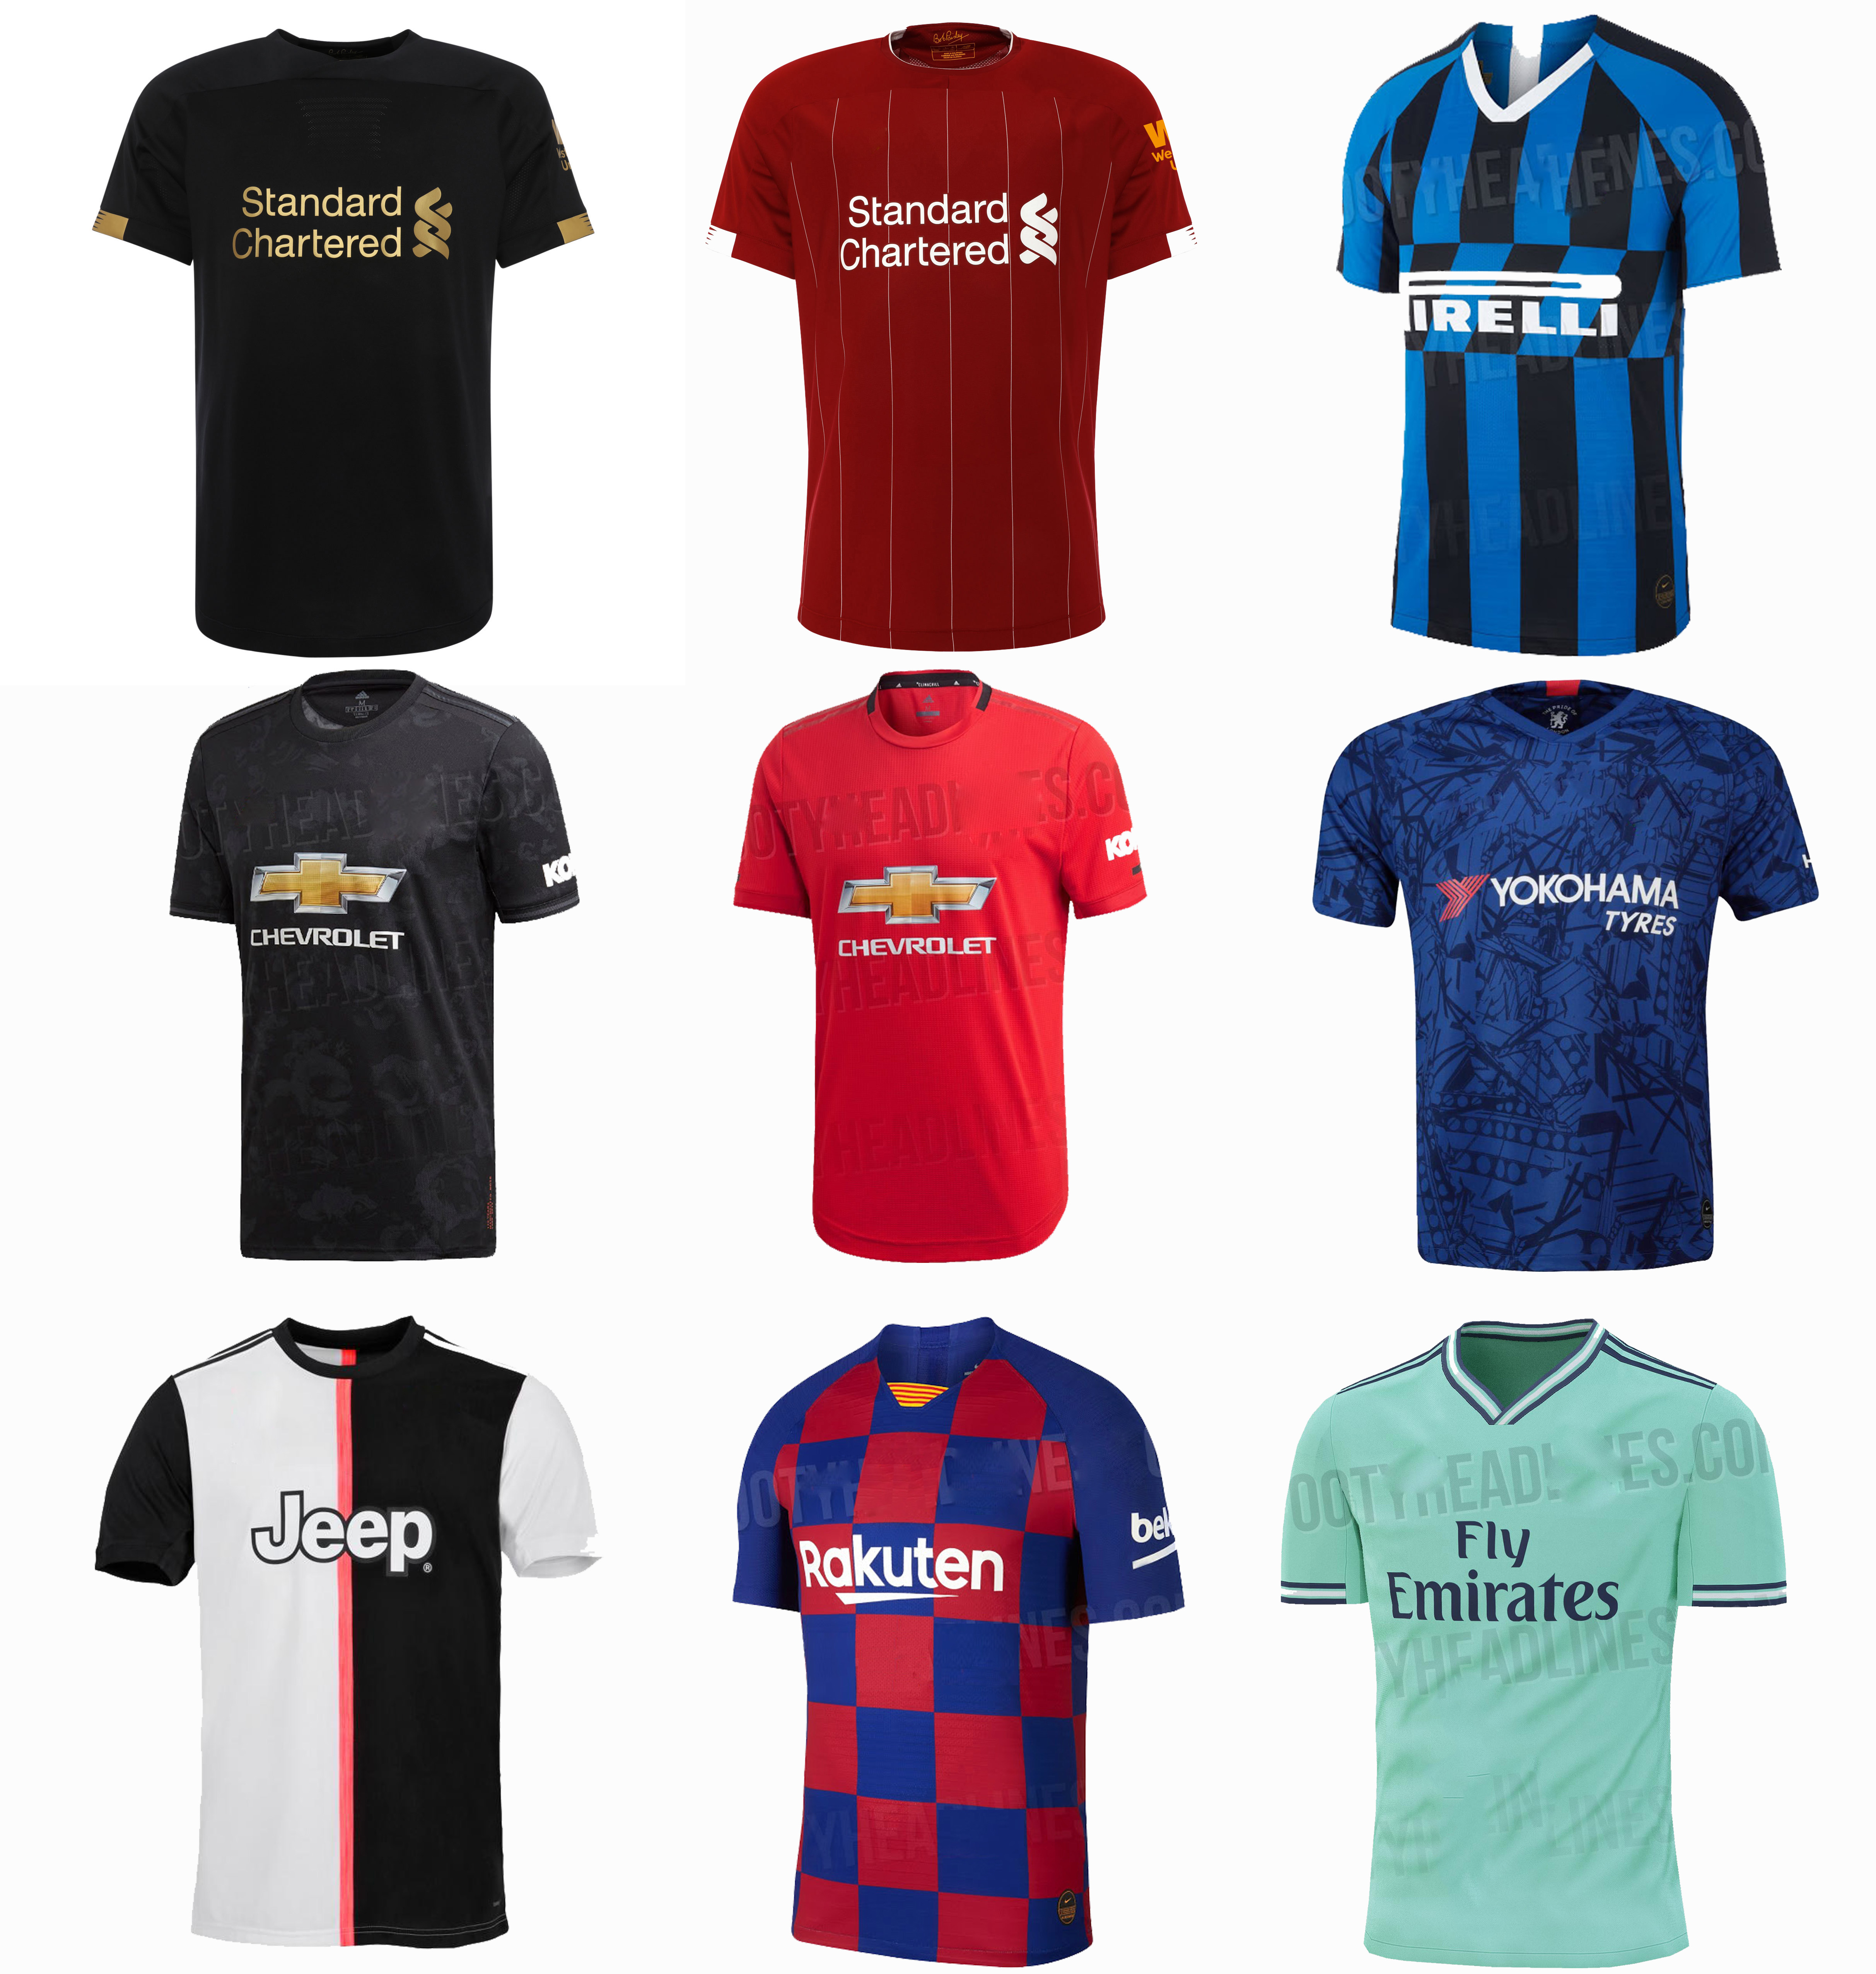 designer fashion c754c 00ccc Good Quality Madrid City United Juventus Tottenham Everton Inter Neymar  Ronaldo Soccer Football Jersey Shirts Kit - Buy City Soccer Jersey,Juventus  ...